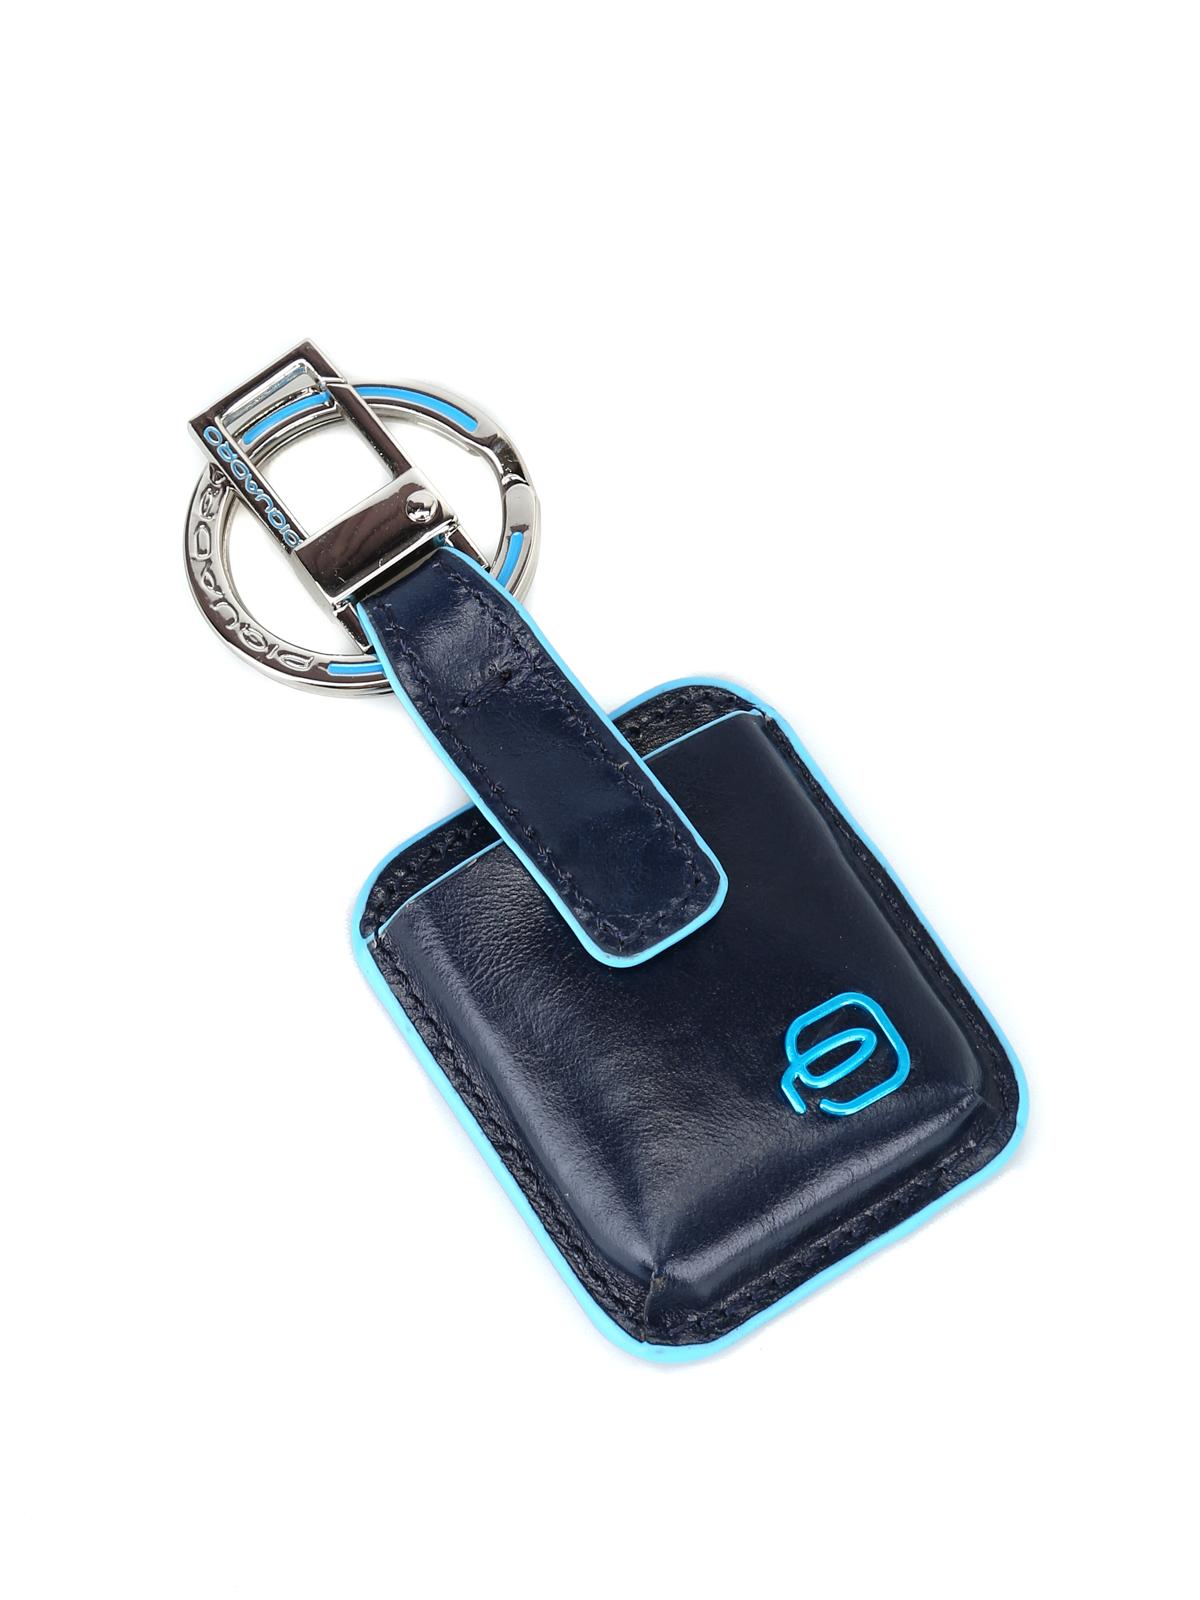 Piquadro Blue Square Connequ System Blue Key Holder